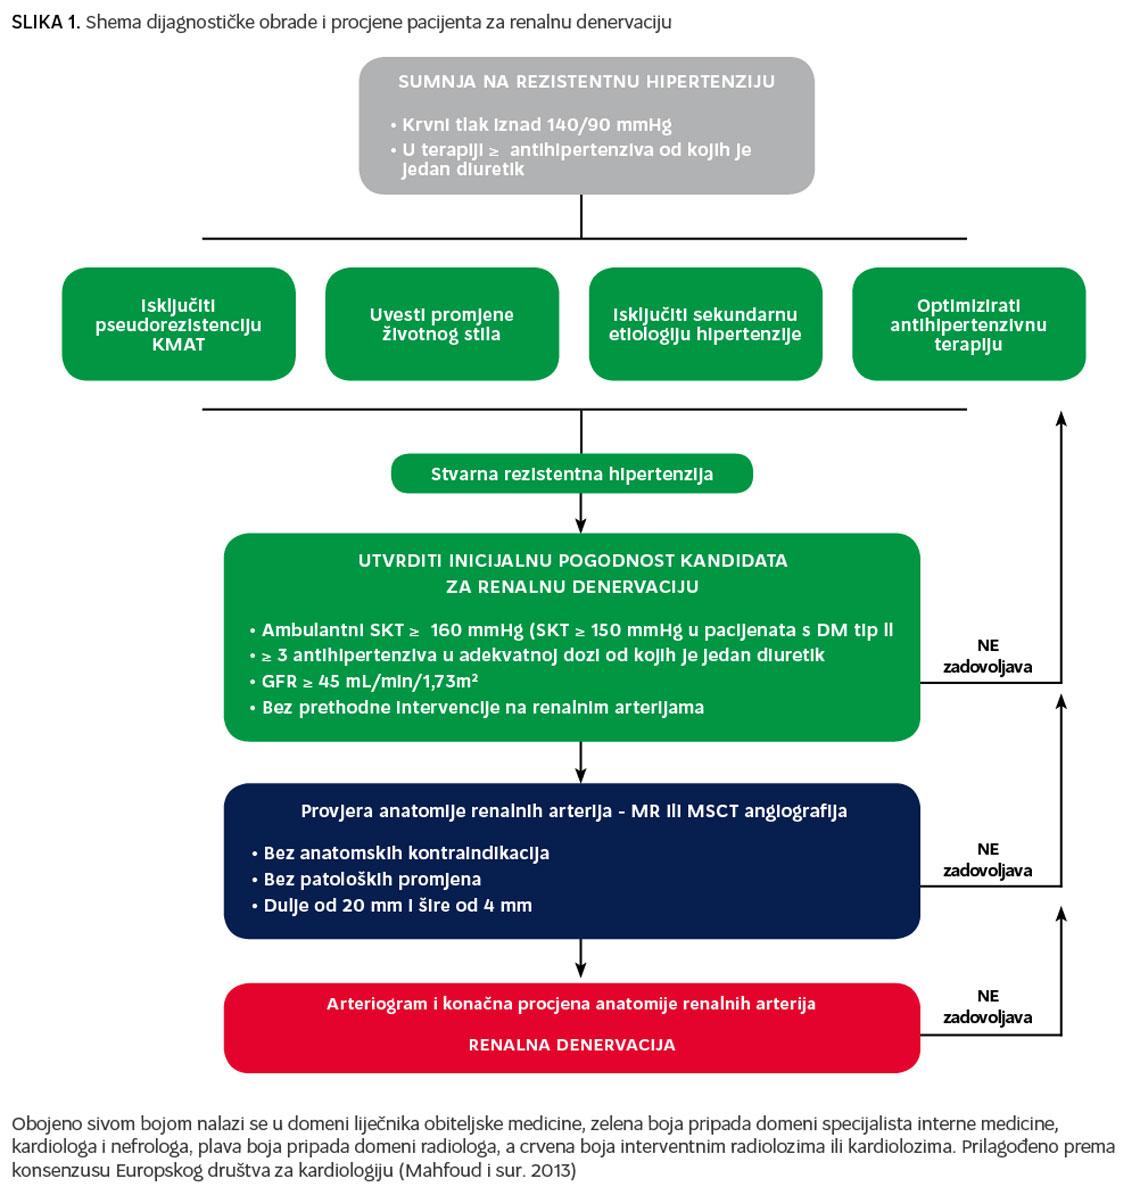 kmat parametri hipertenzije